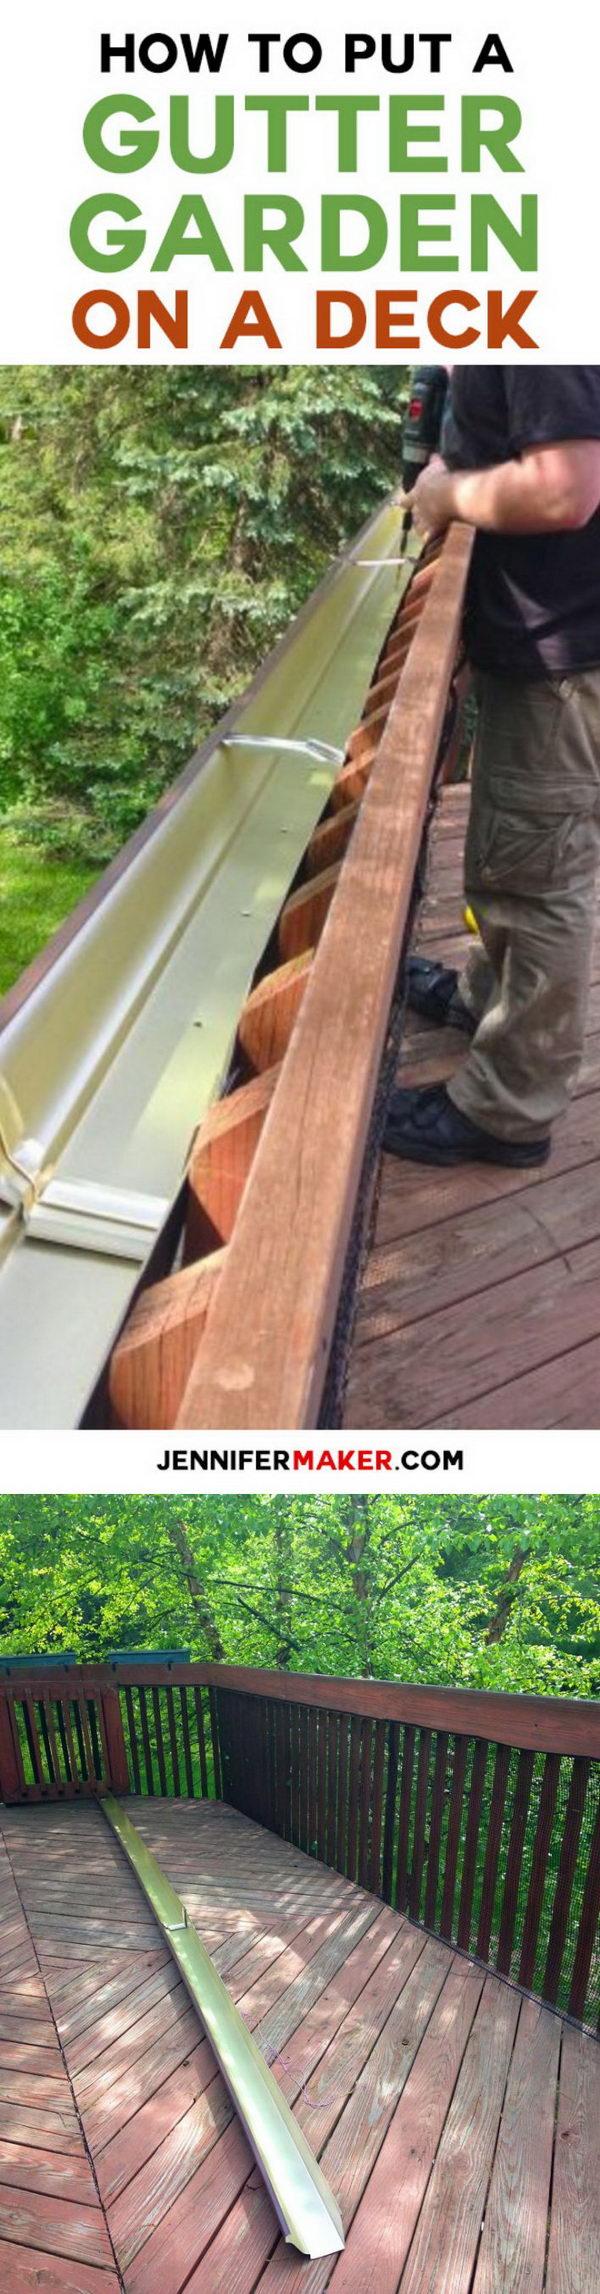 DIY Gutter Garden On Deck Railing.